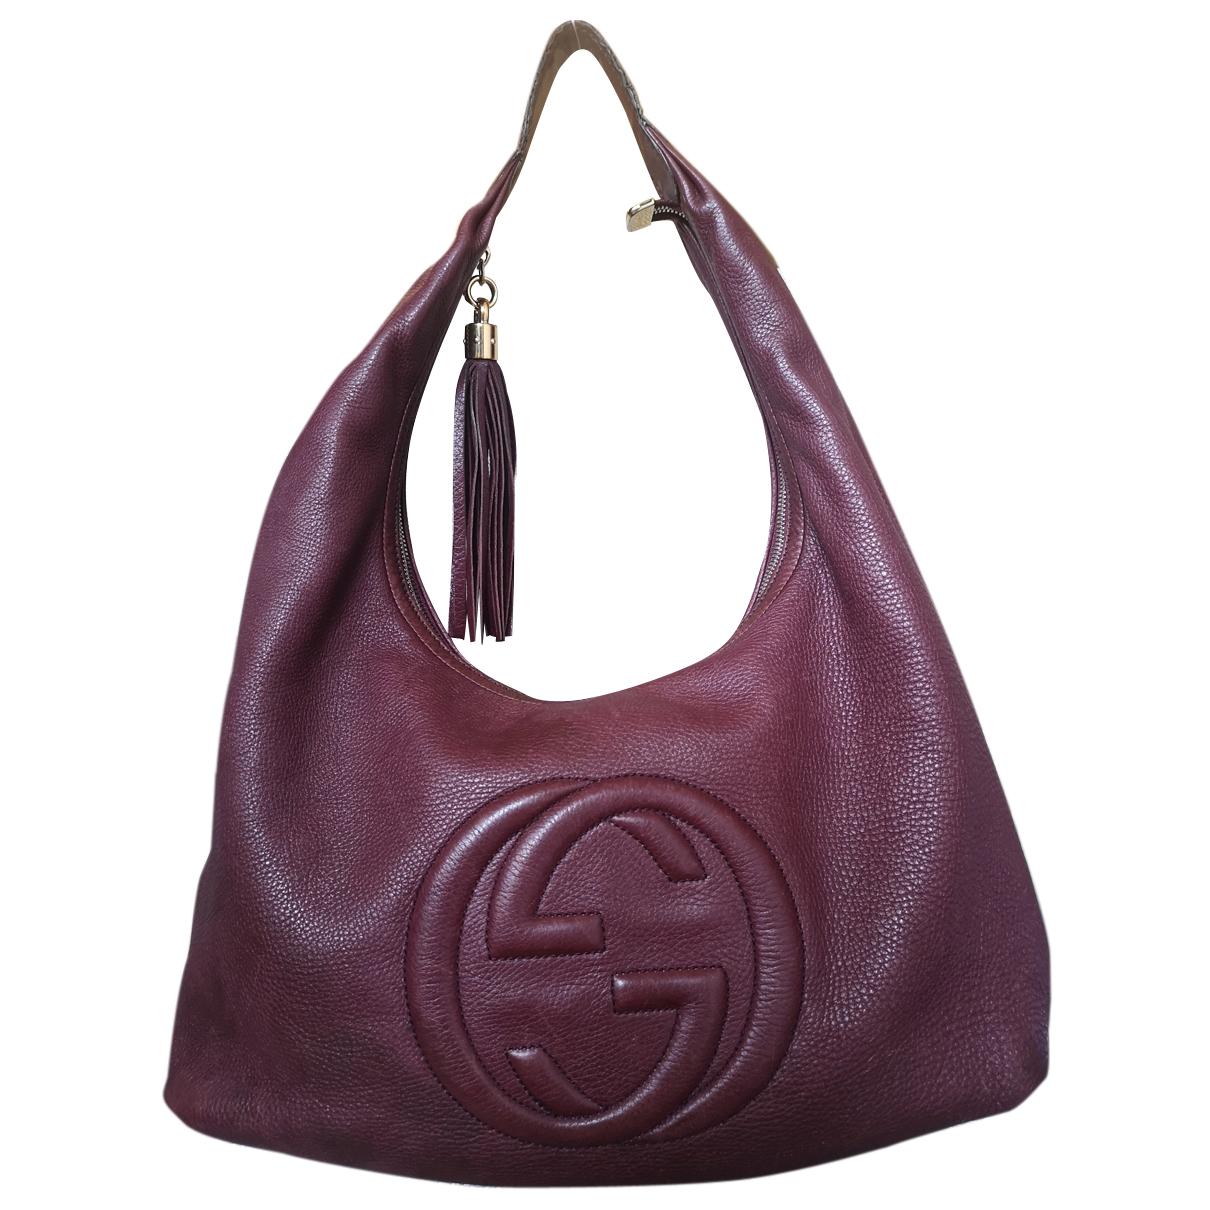 Gucci Soho Burgundy Leather handbag for Women N